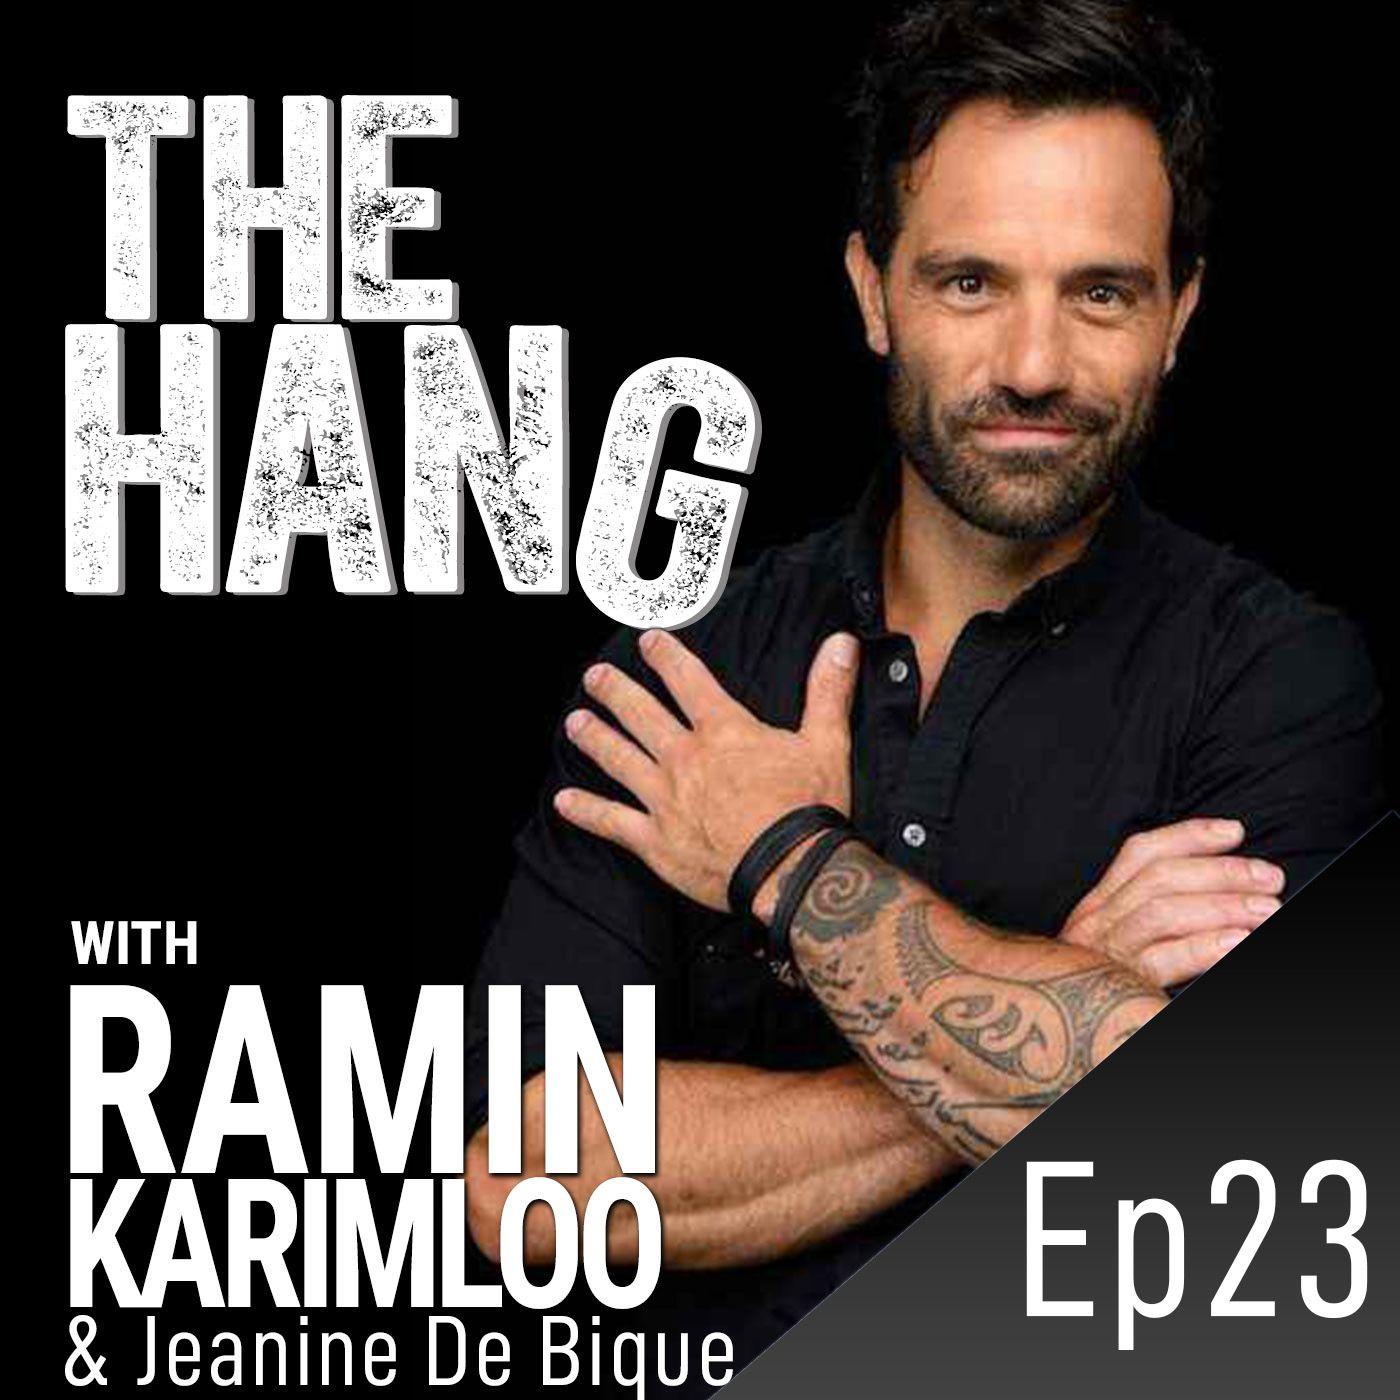 #23 - Hanging with Jeanine De Bique